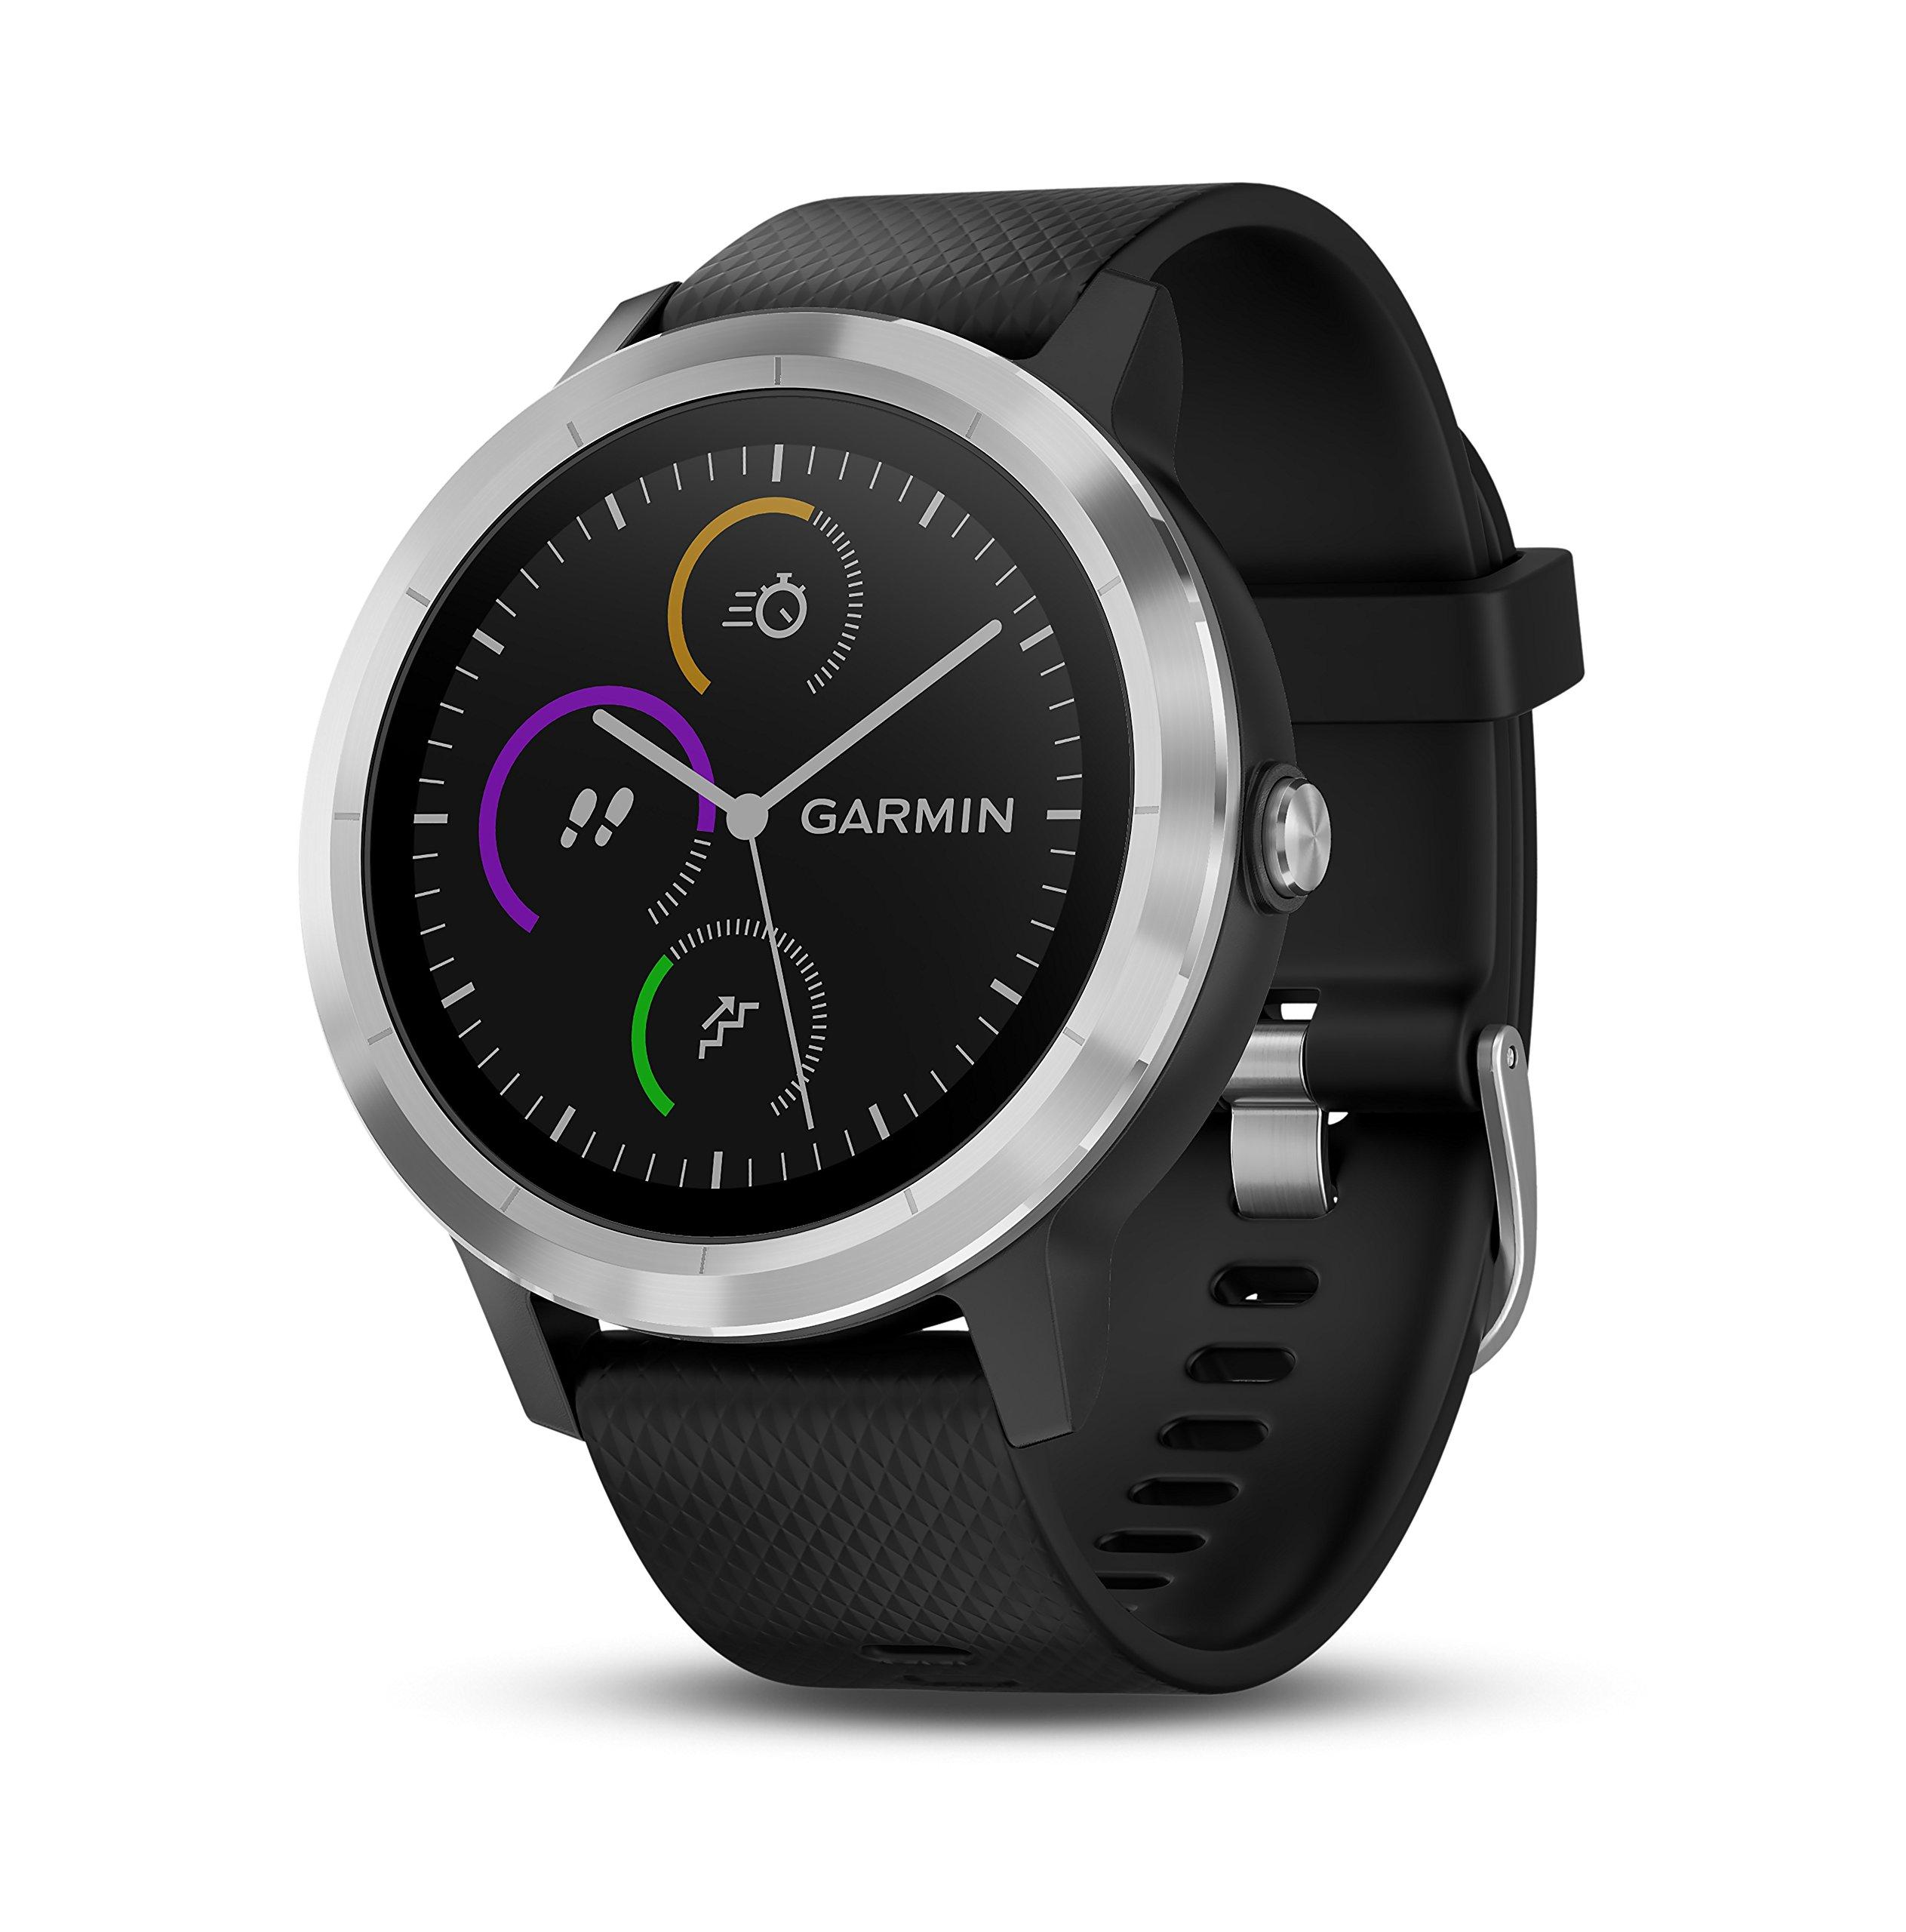 Garmin vívoactive 3 GPS Smartwatch - Black & Stainless by Garmin